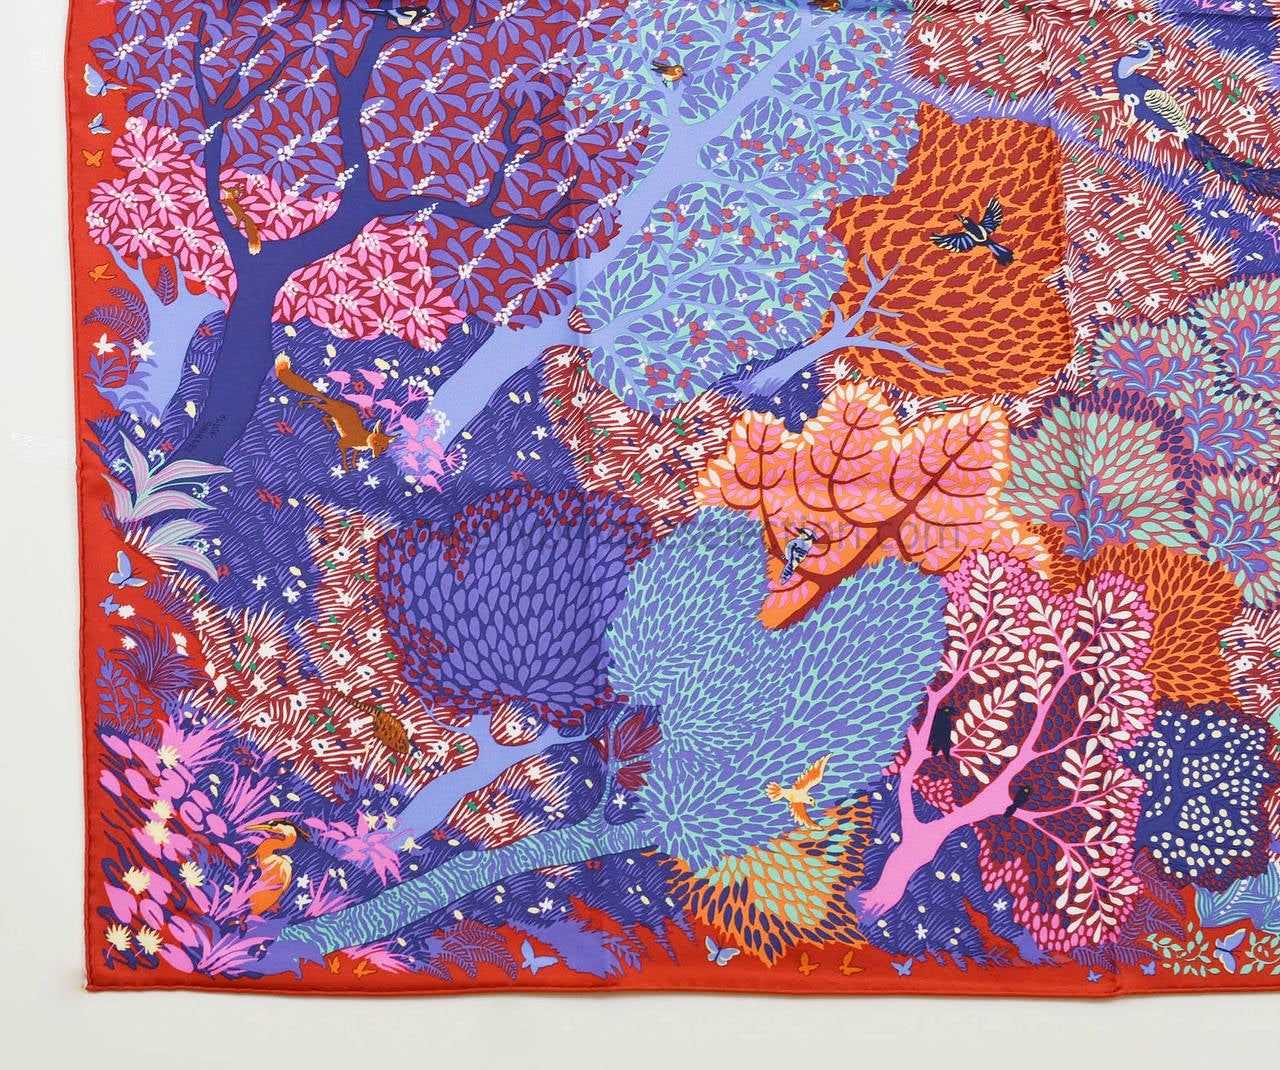 Hermes carre twill silk dans un jardin anglais red purple Dans un jardin anglais hermes